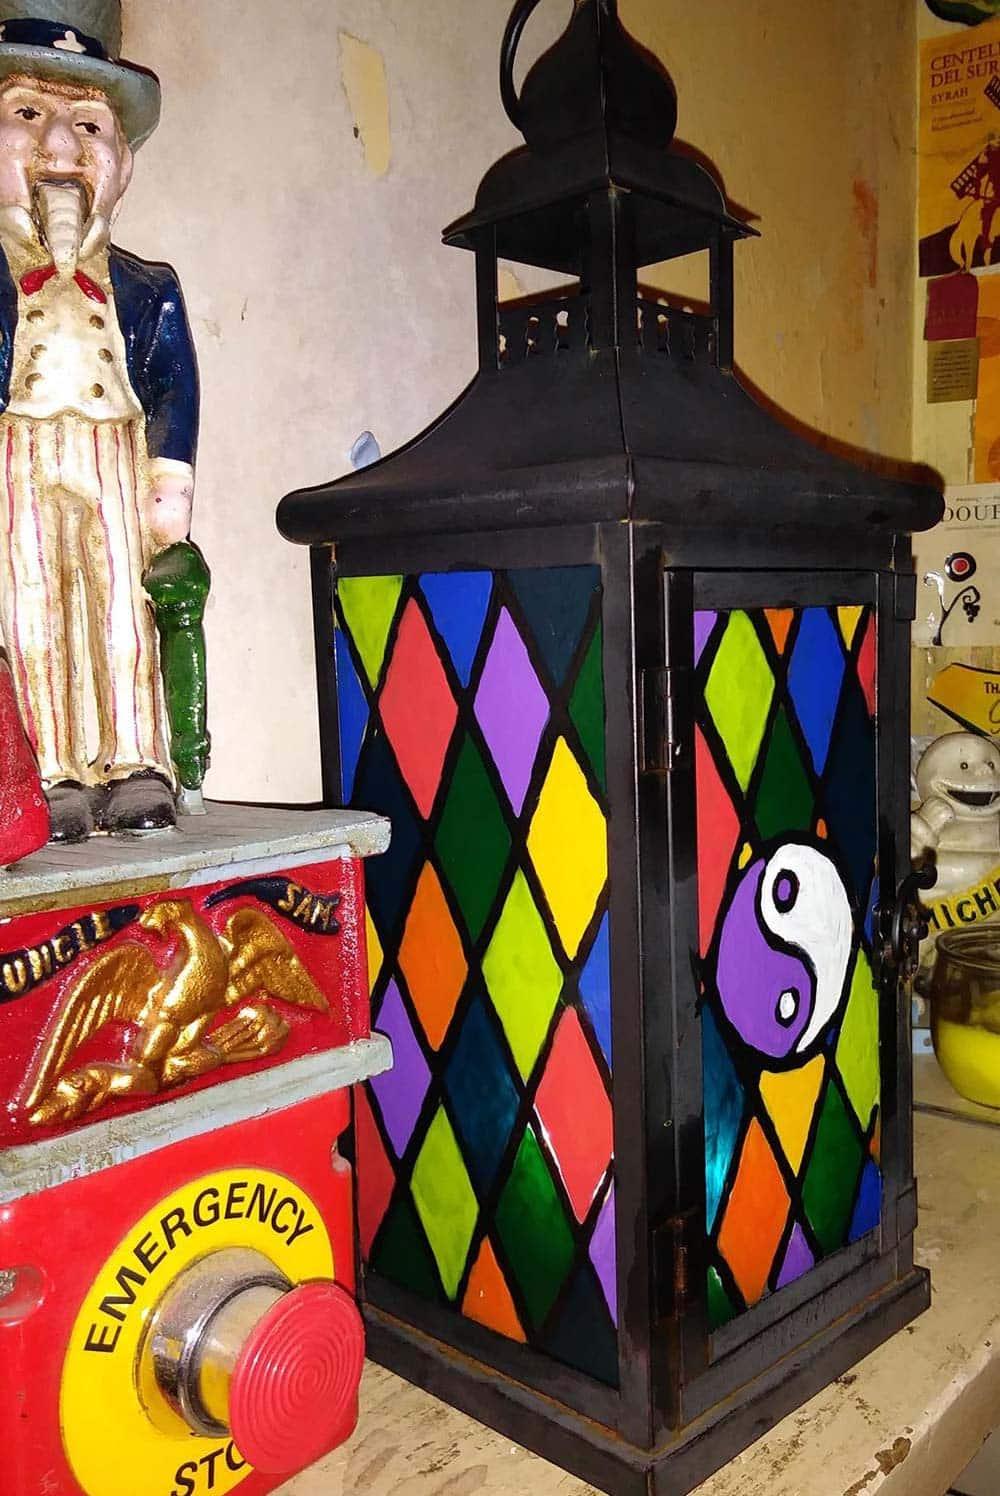 Lantern-with-translucent-Peelable-Glass-Paint-decoration